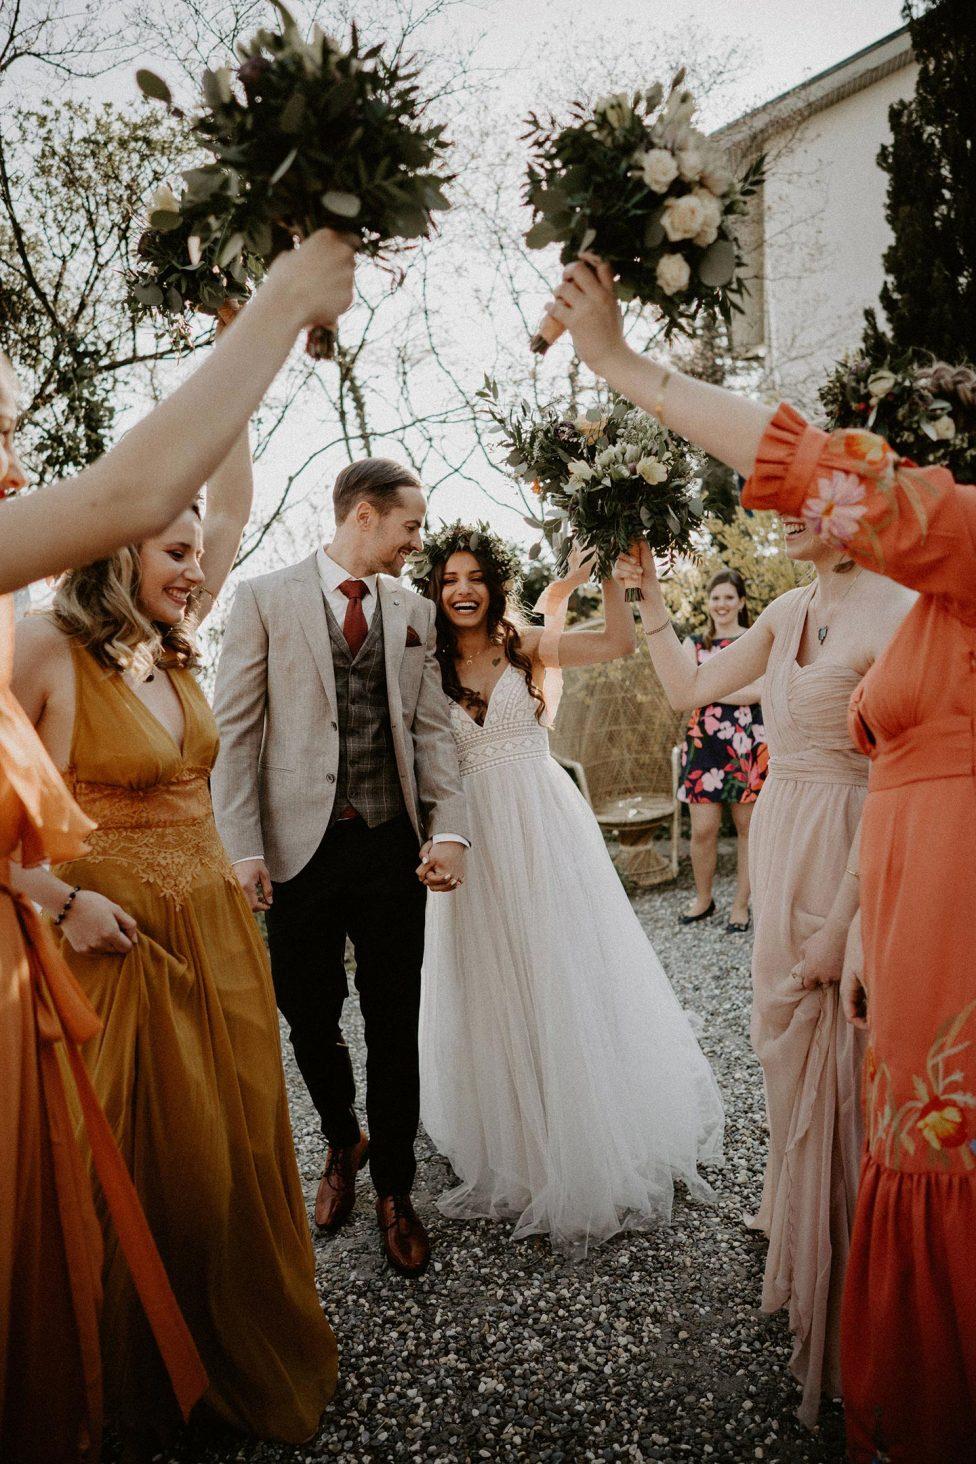 Boho Hochzeitsinspiration im Flower-Power-Chic